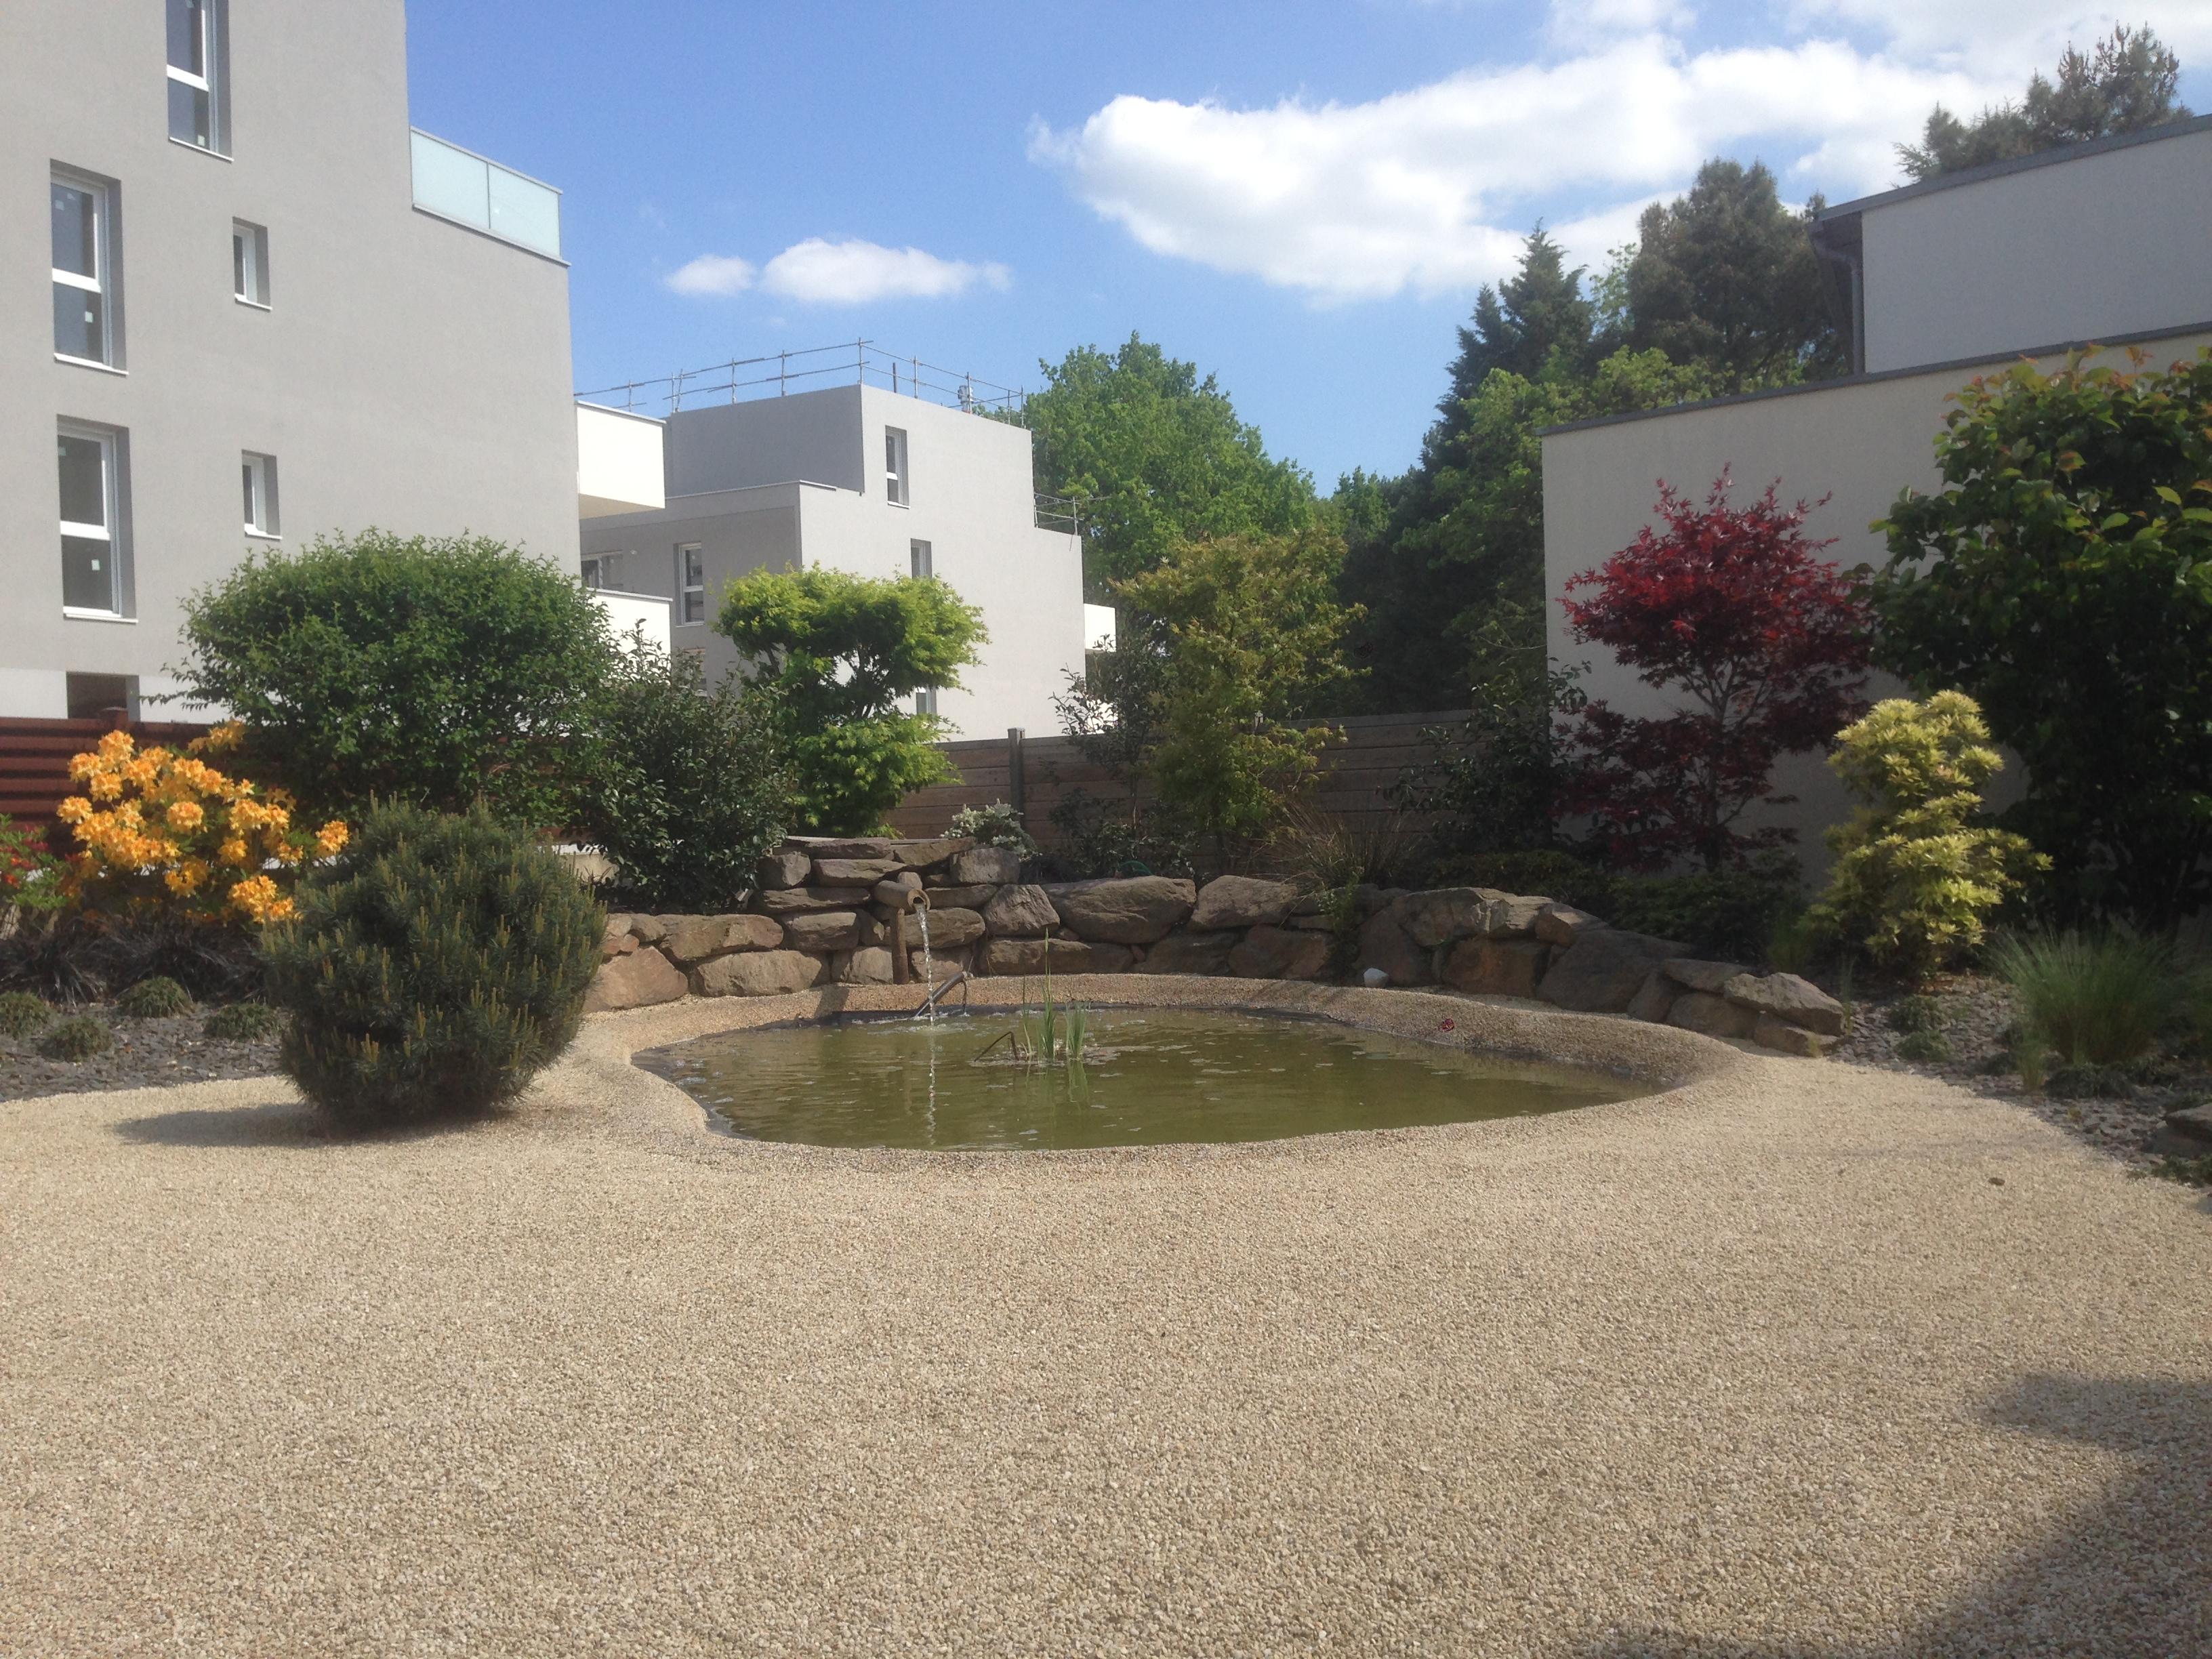 Aménagement paysager - Rennes